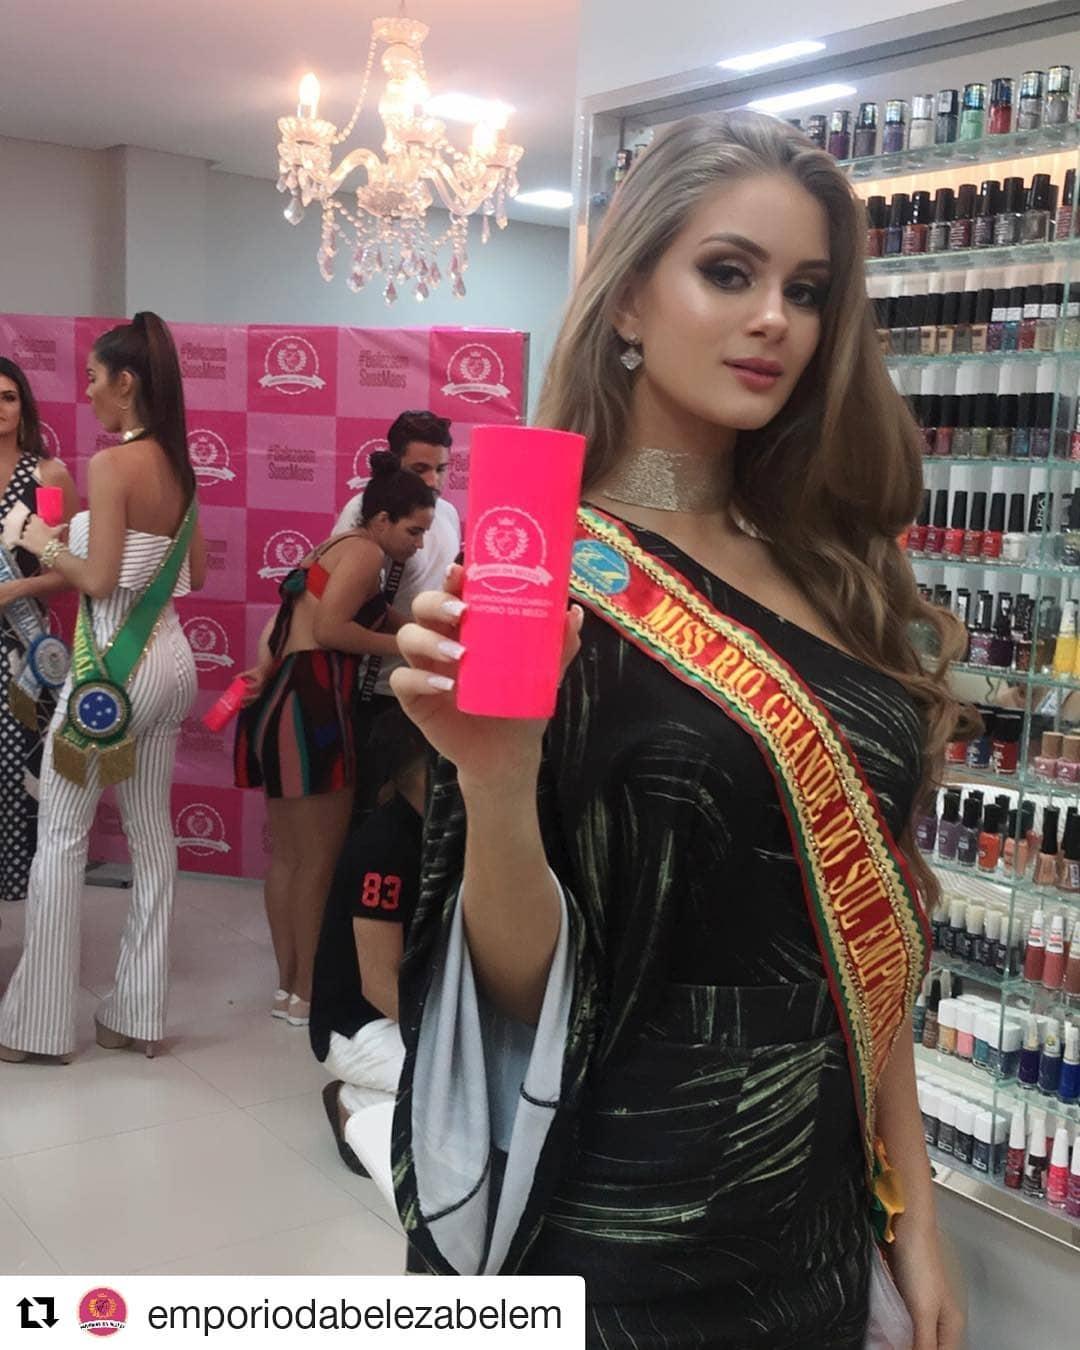 gabriela palma, miss brasil empresarial 2018. - Página 6 39492010